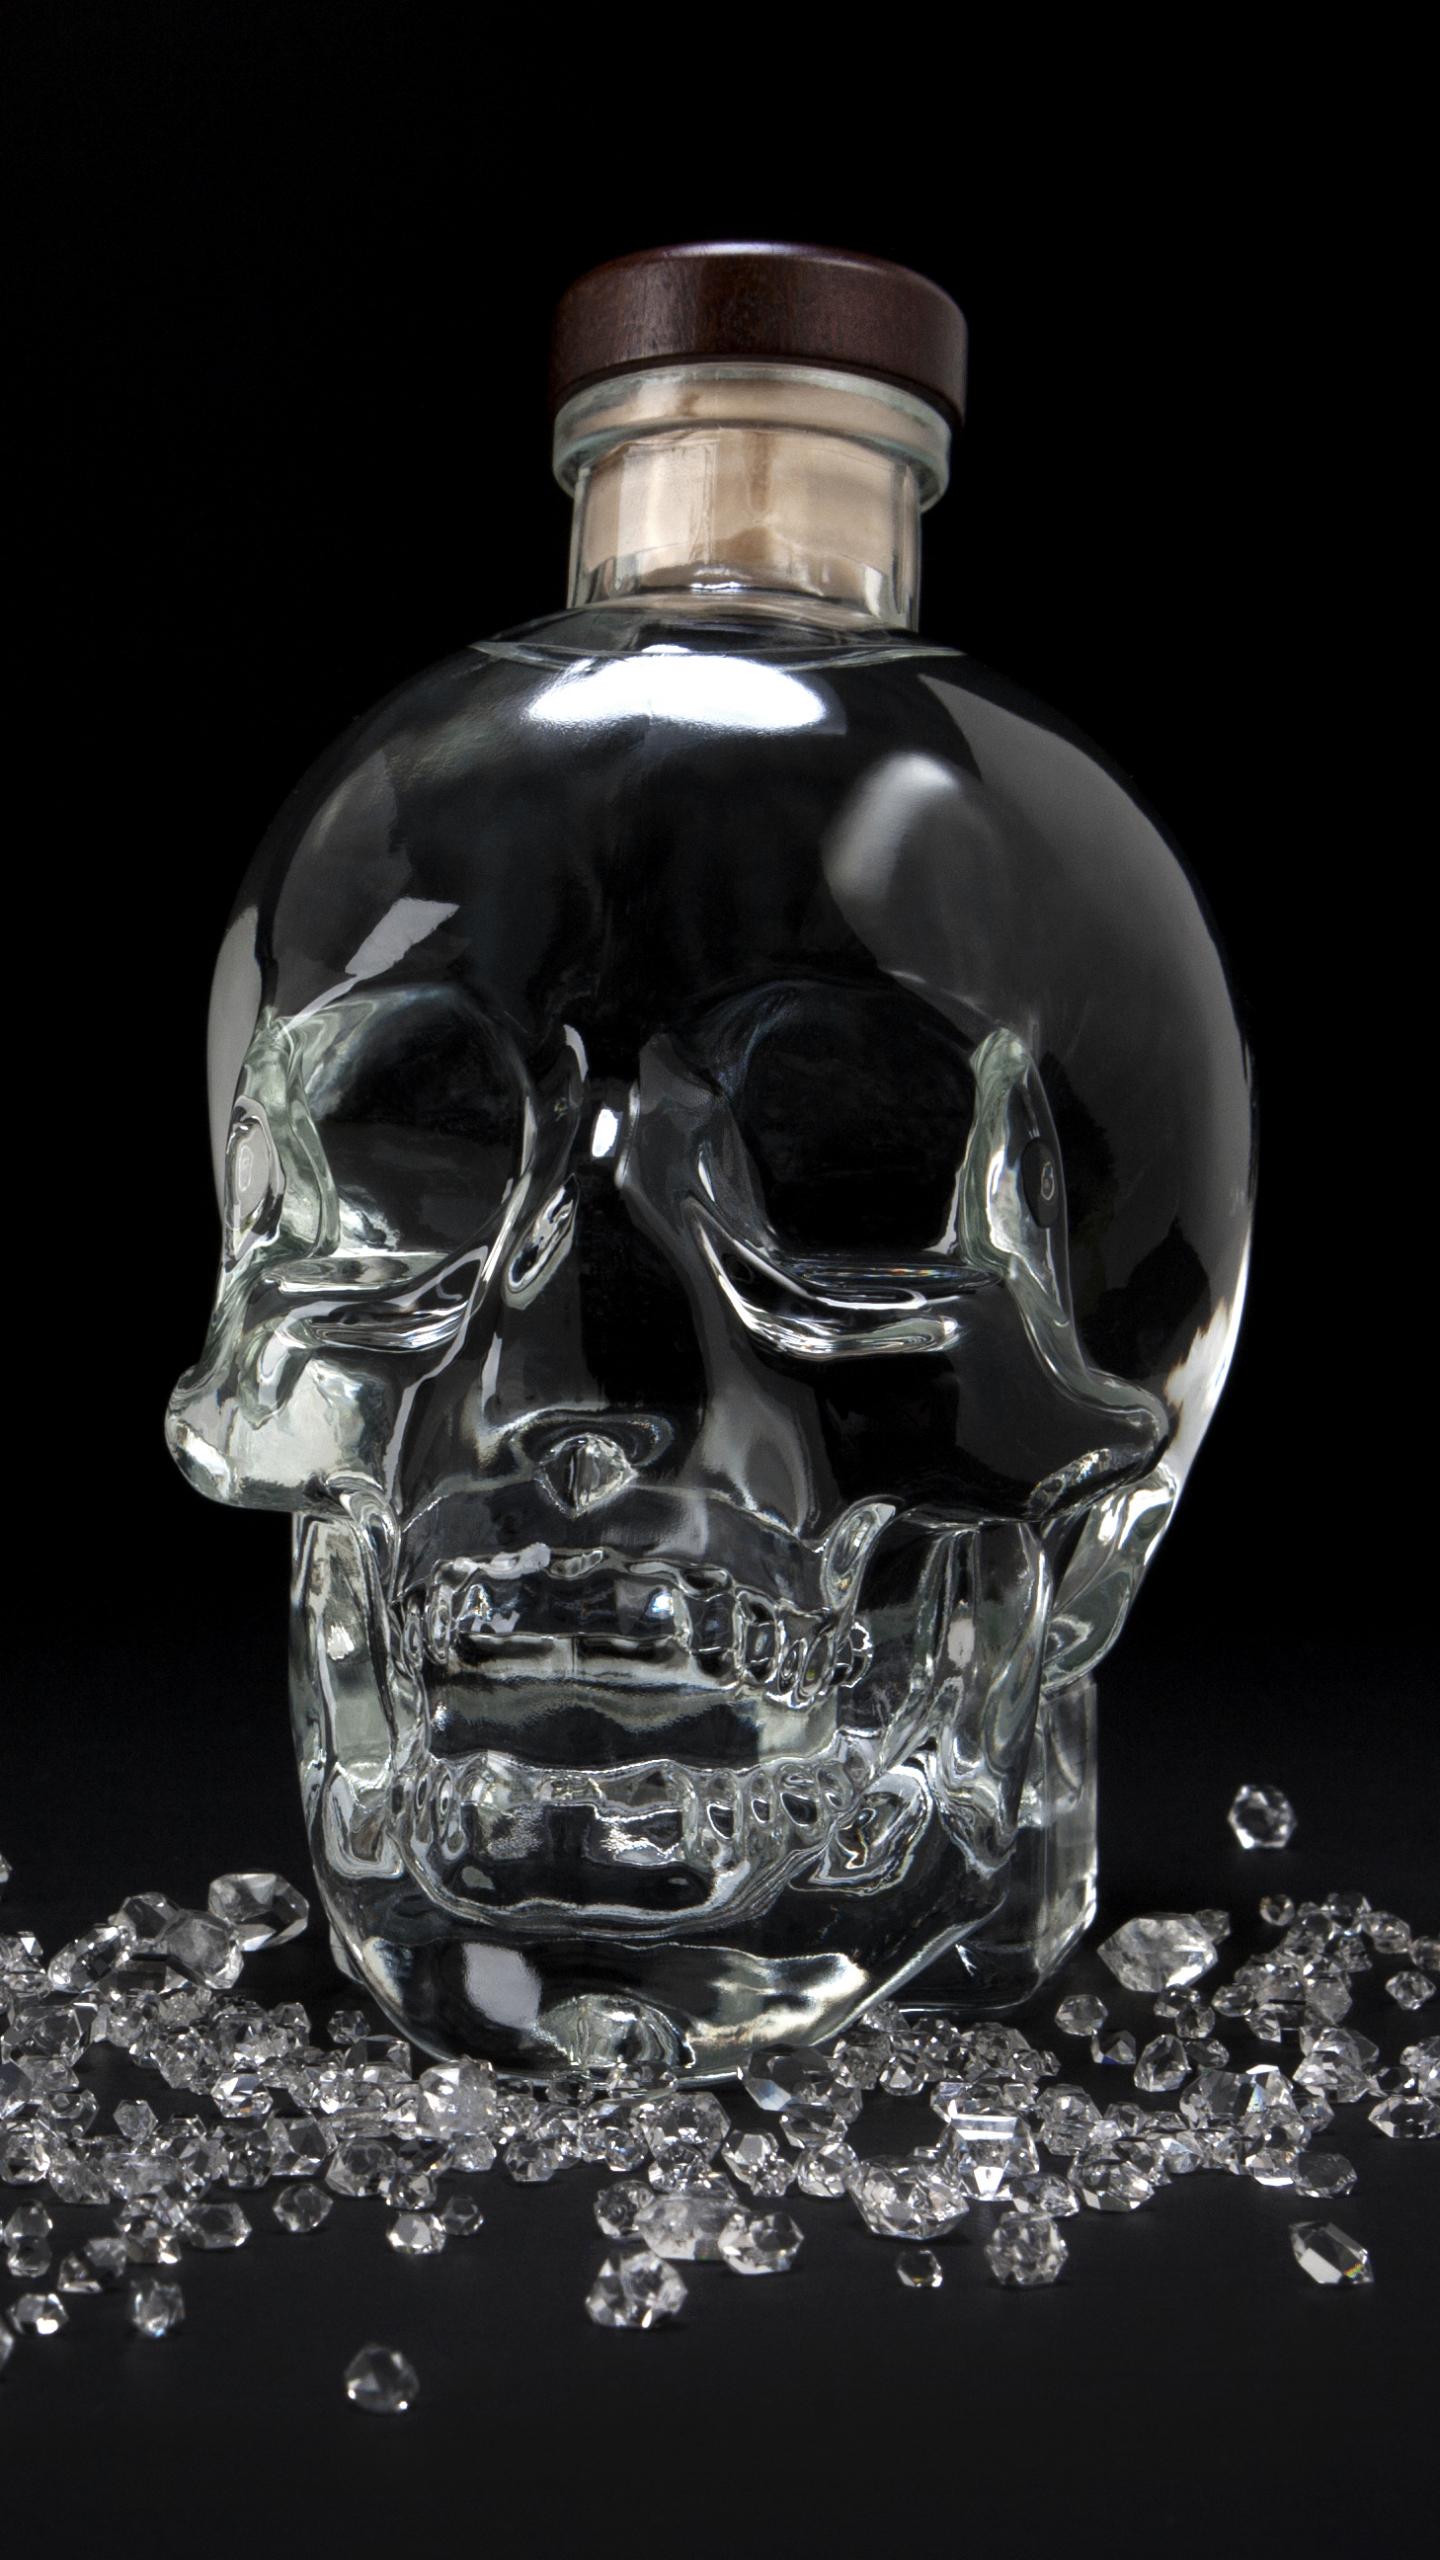 Wallpaper Crystal Head Vodka Black 1767000 Hd